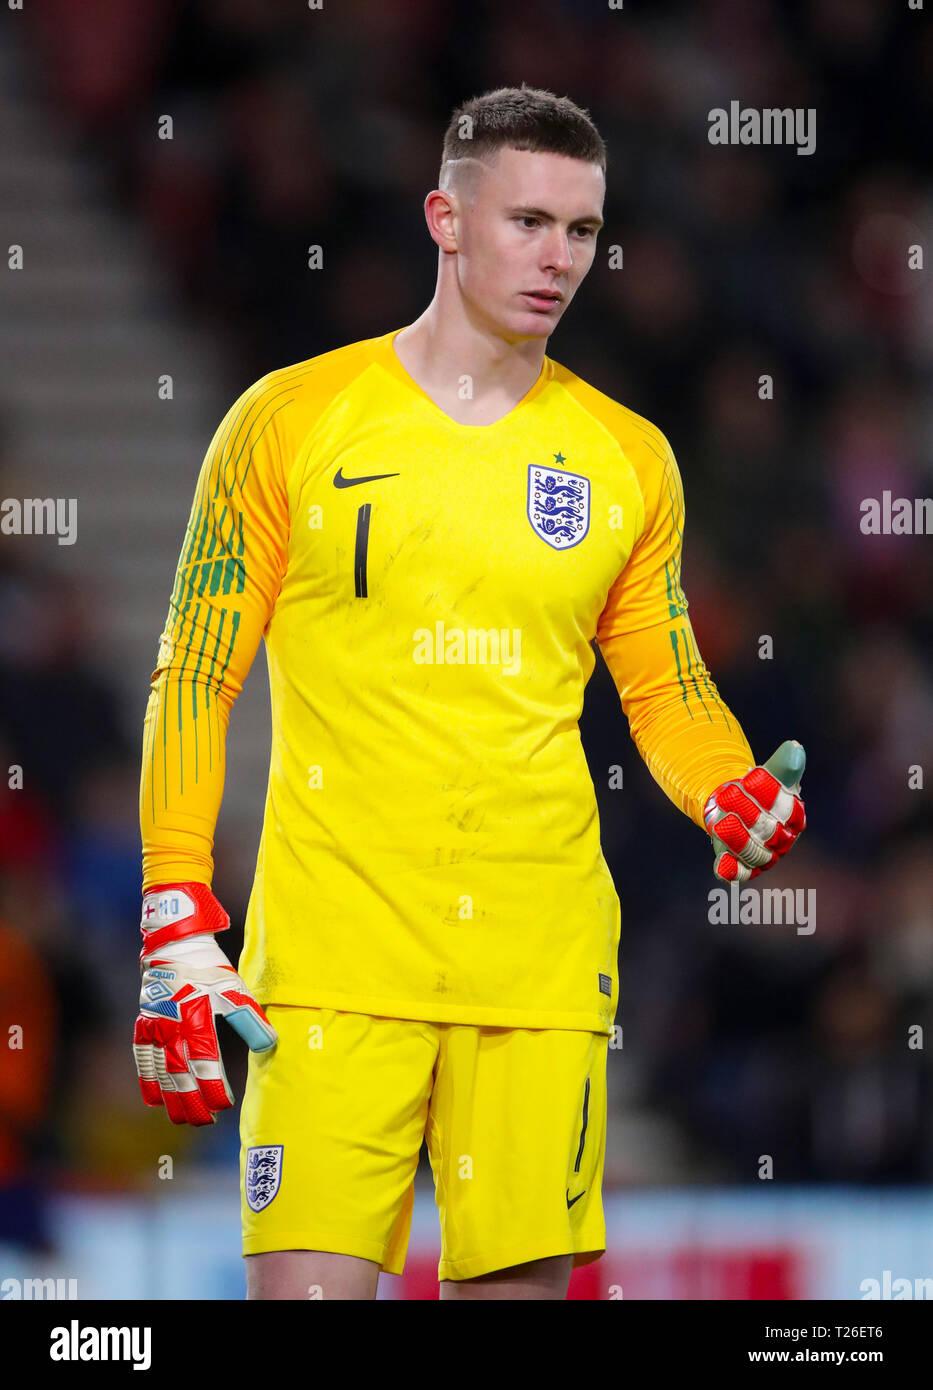 factory authentic 8e0f5 8401b England goalkeeper Dean Henderson Stock Photo: 242317830 - Alamy